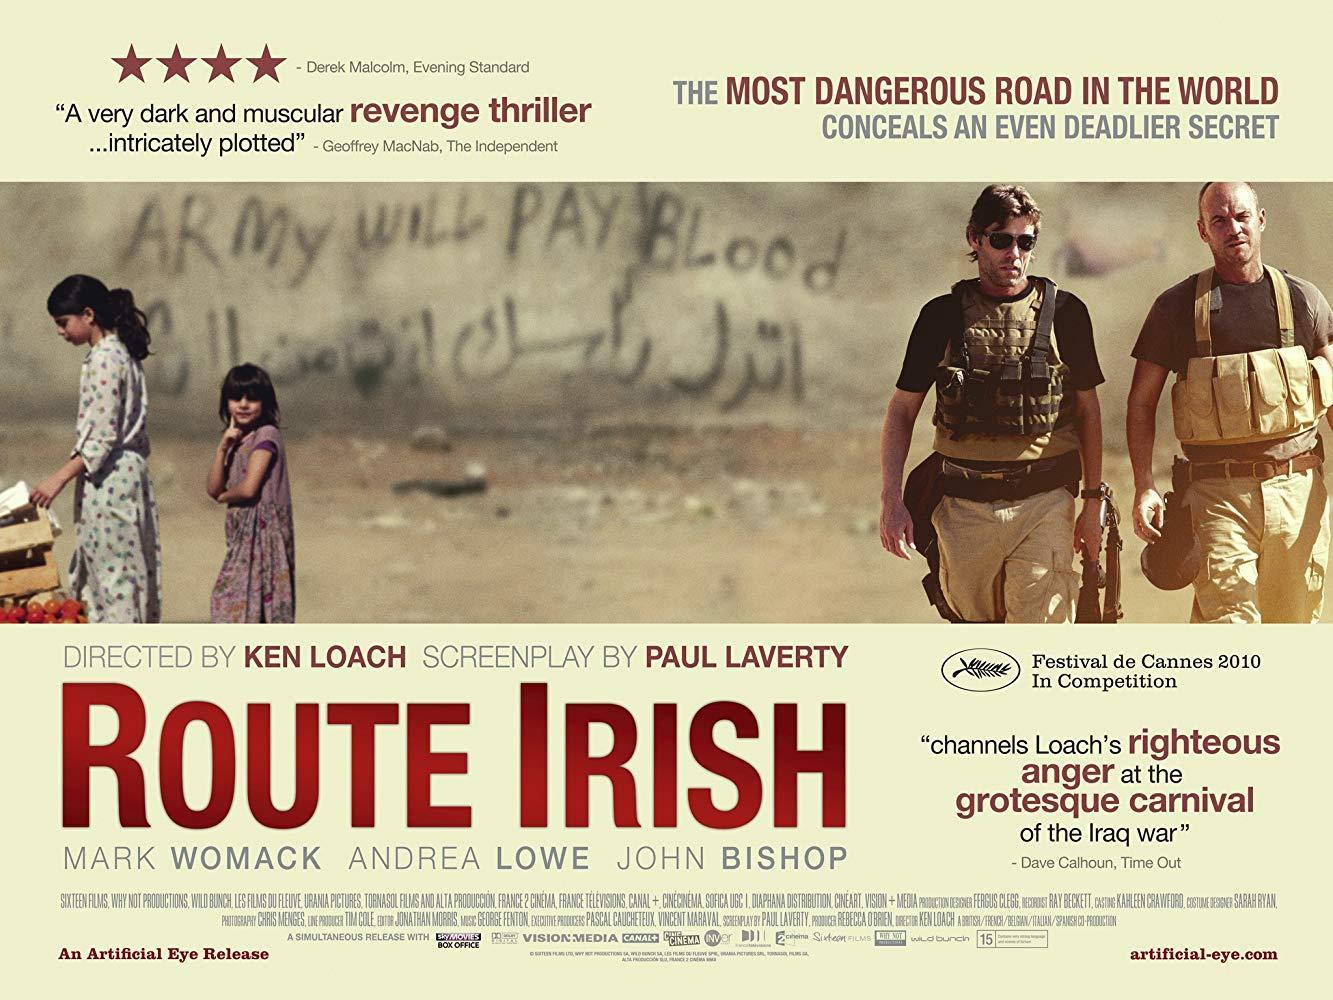 مشاهدة فيلم Route Irish 2010 HD مترجم كامل اون لاين